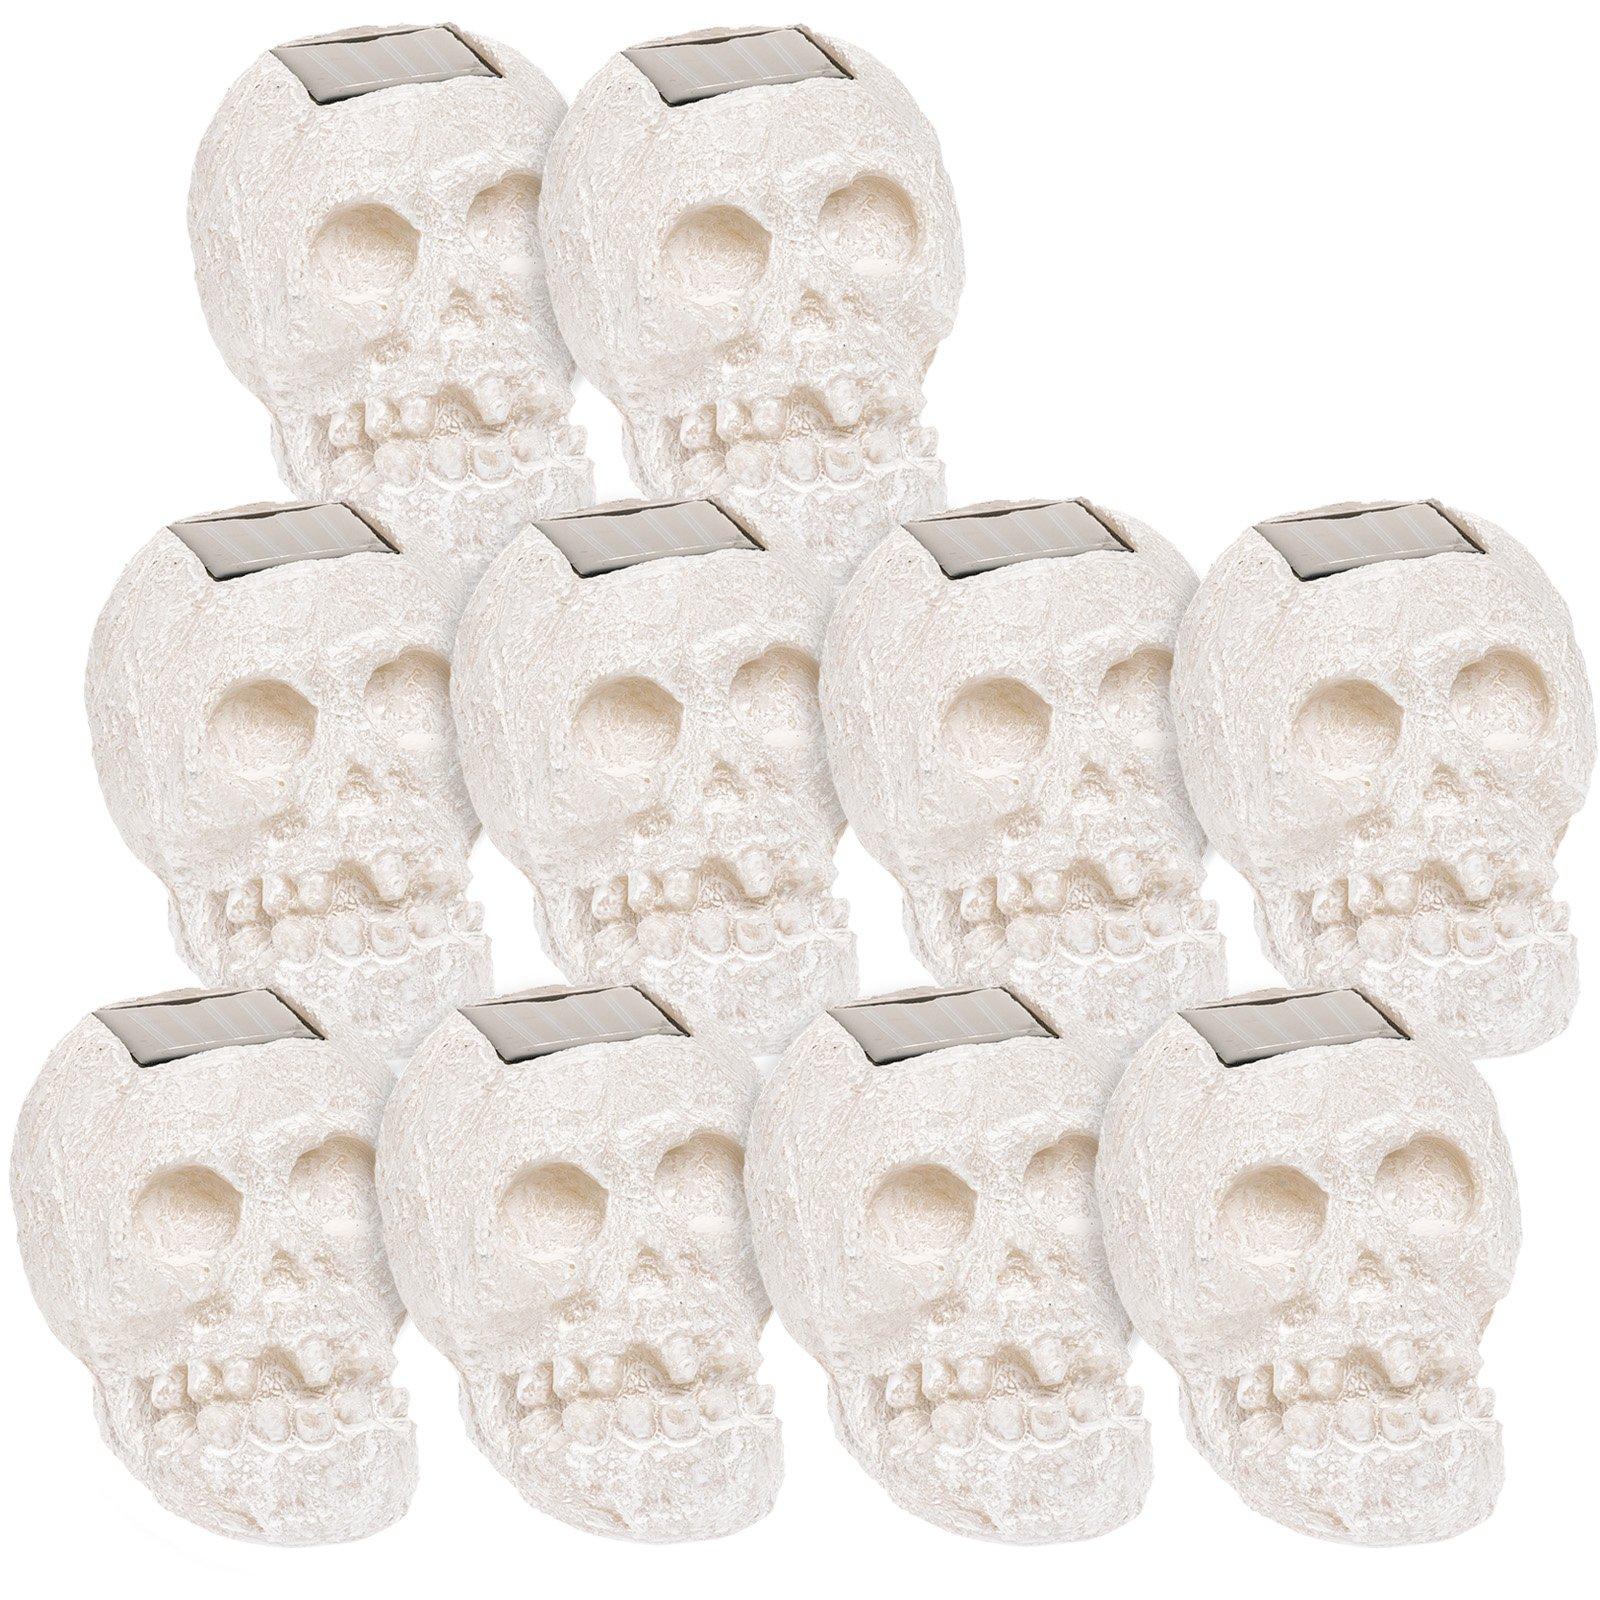 (10 Pack) SKULLar Translucent Solar LED Outdoor Skull Fright Lights (White)